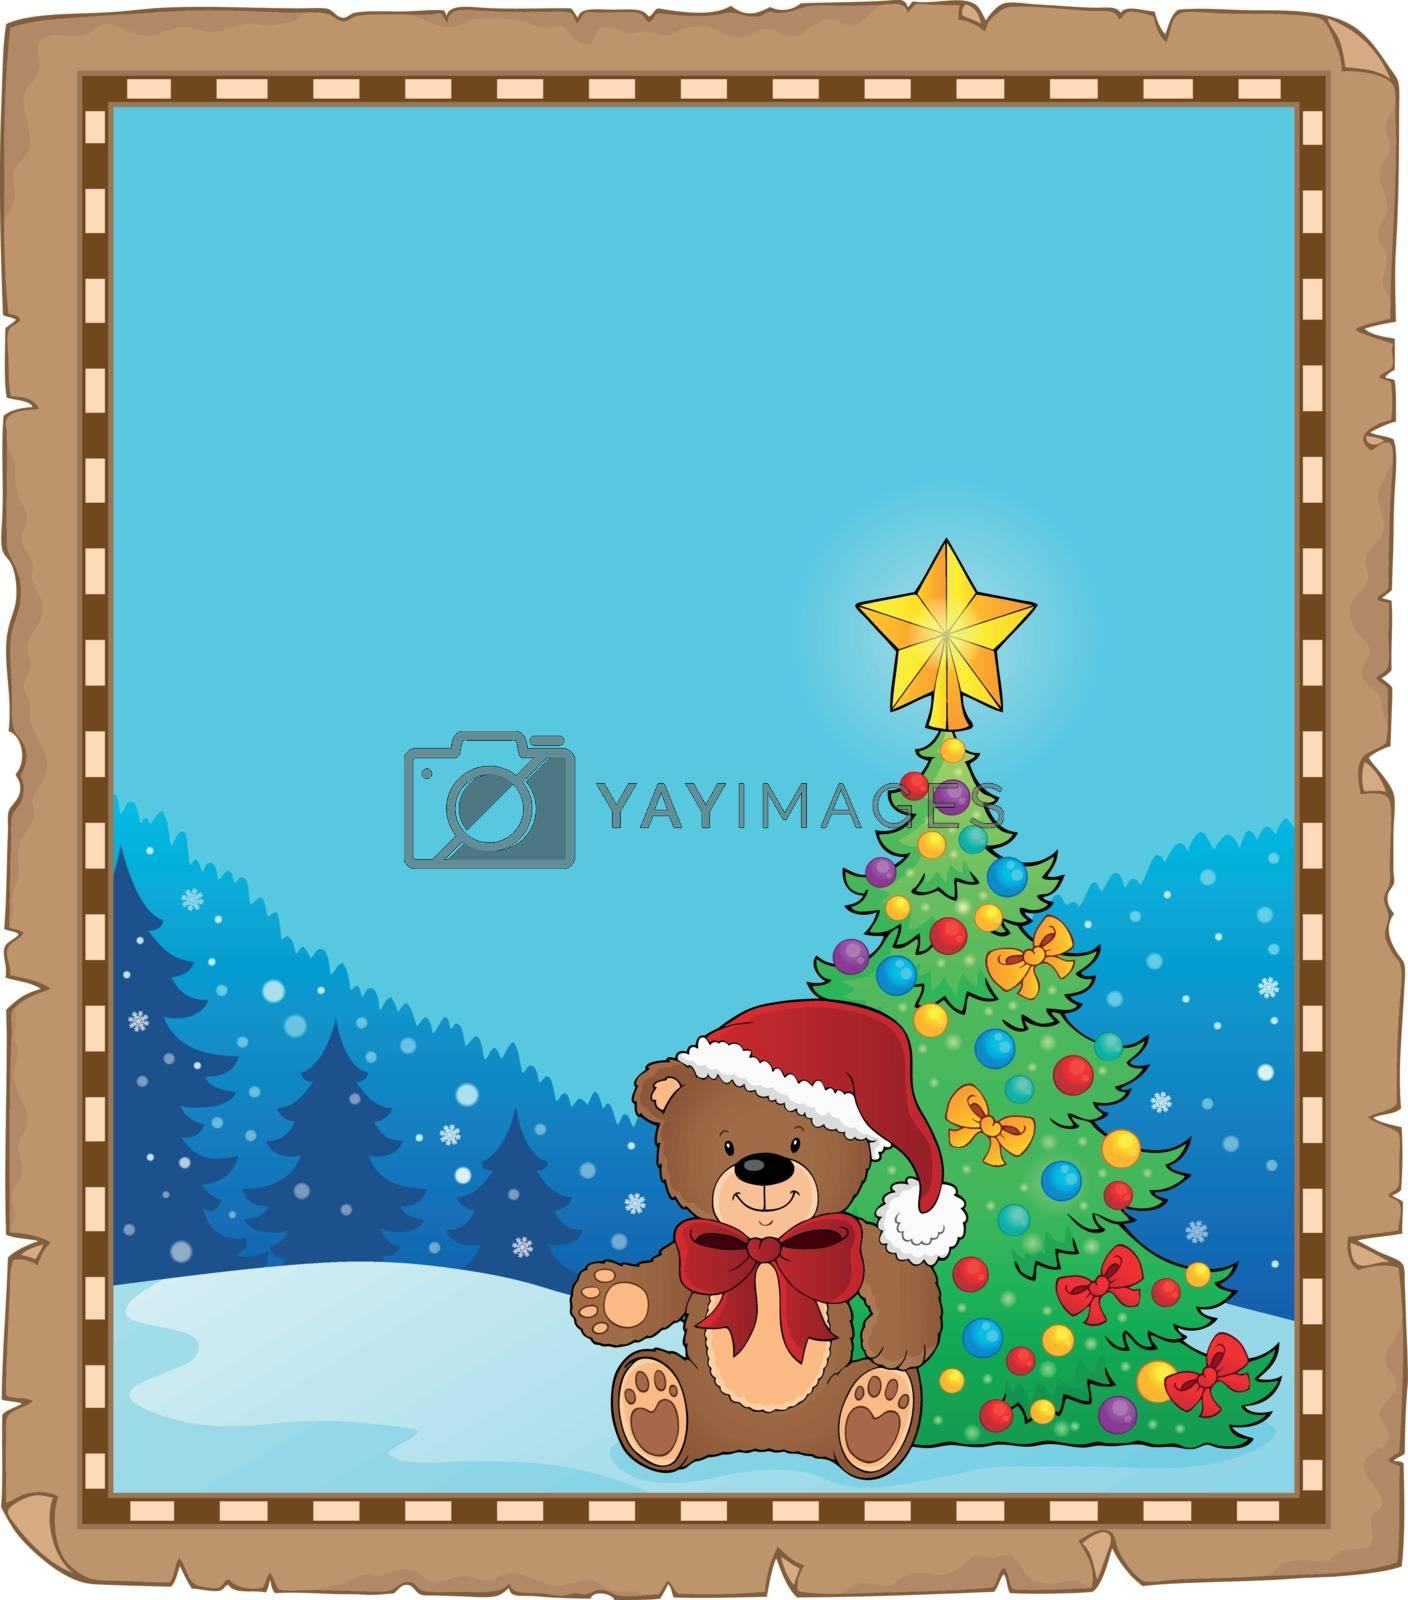 Christmas teddy bear topic parchment 1 - eps10 vector illustration.